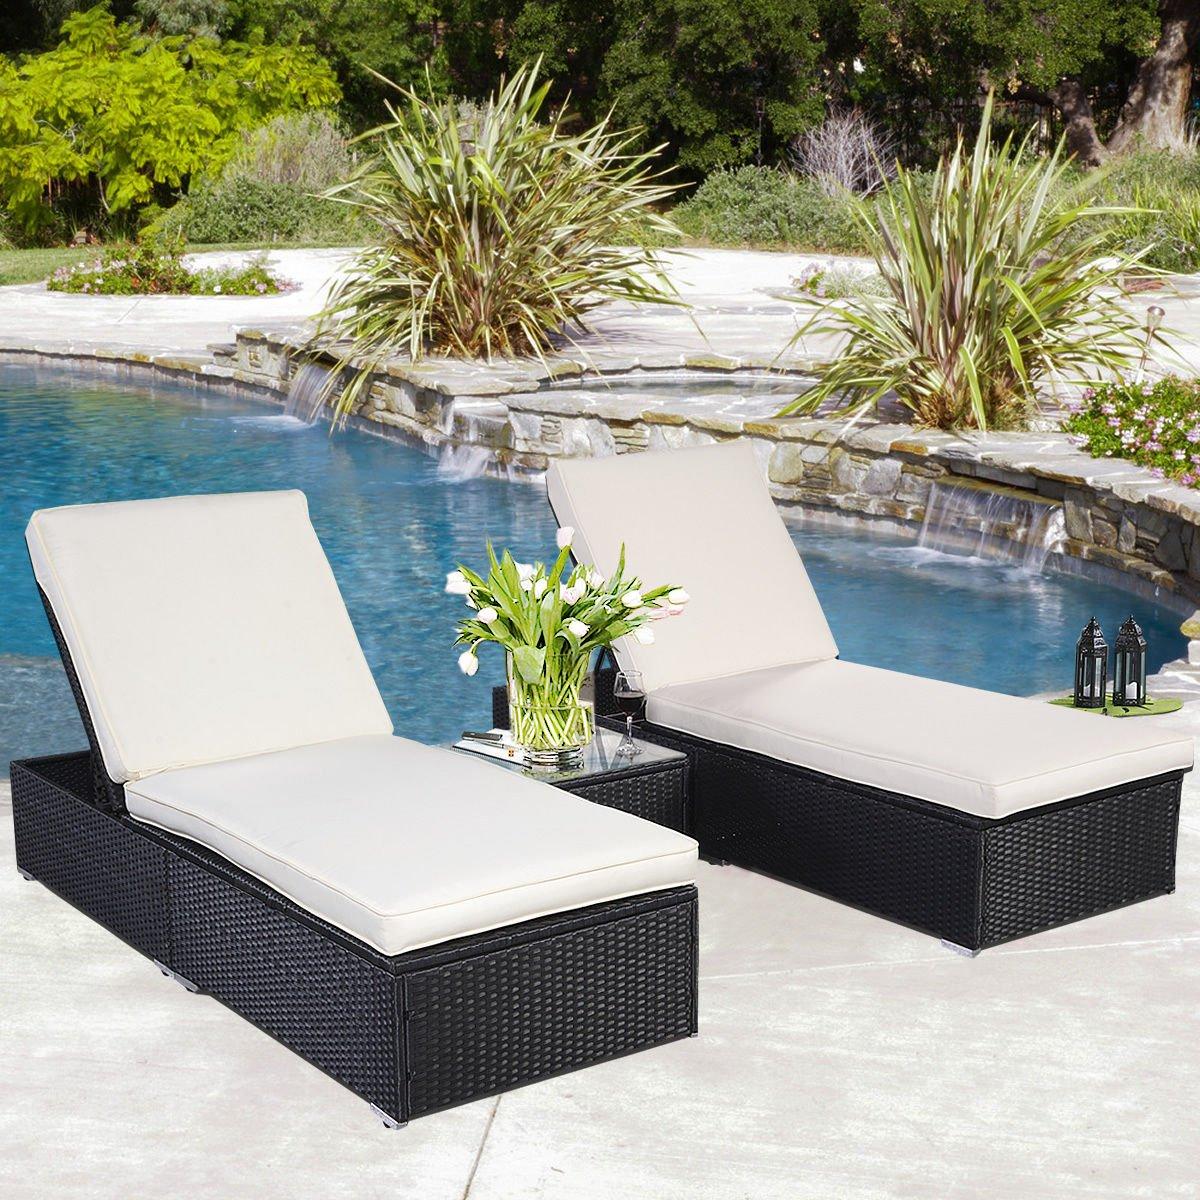 globe house products ghp 3 pc black wicker rattan patio pool chaise lounge tea